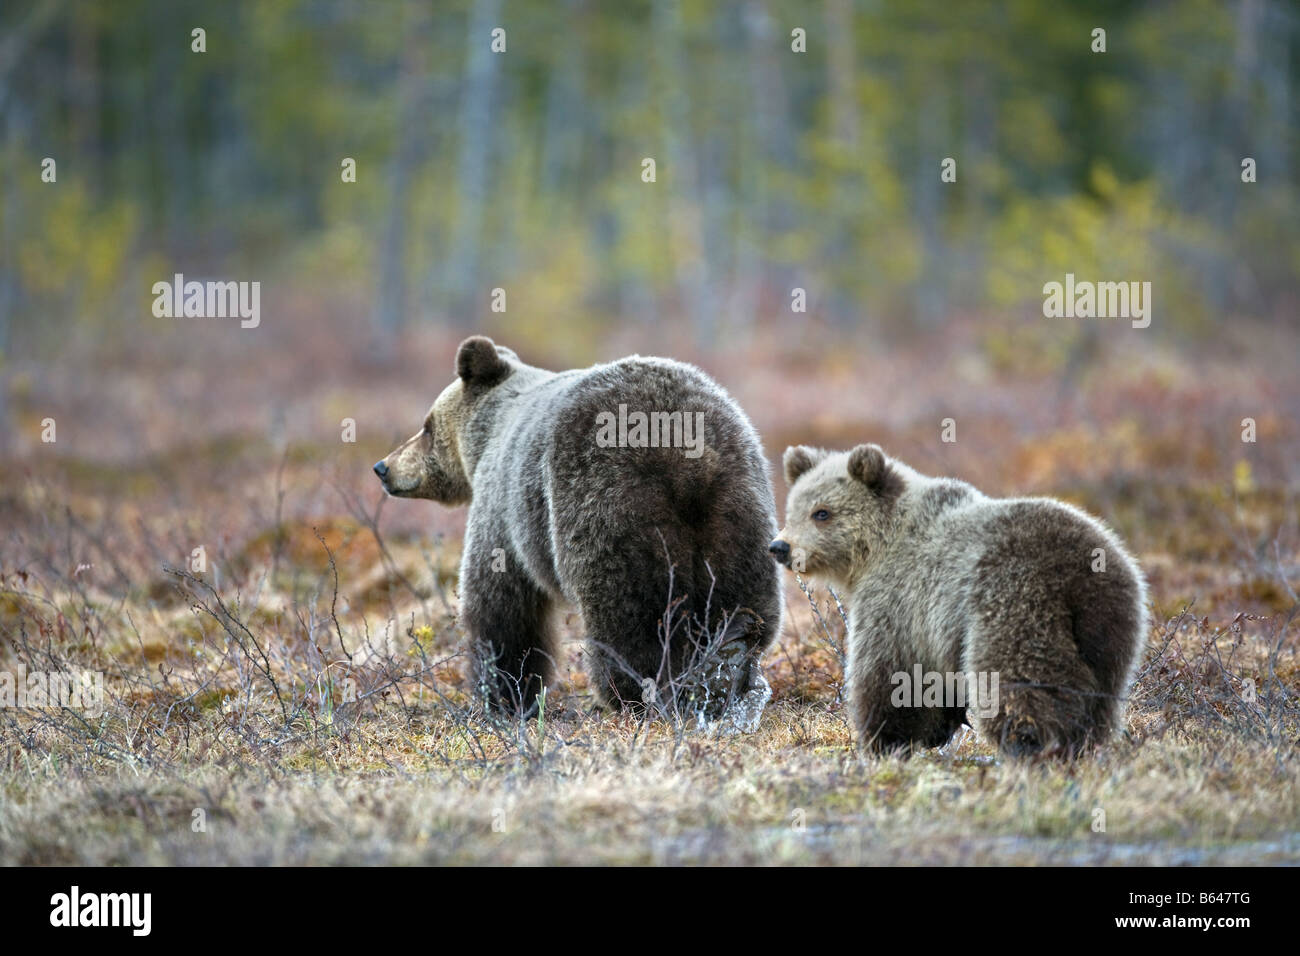 Finland, Ruhtinansalmi, near Suomussalmi, Wildlife Centre Martinselkonen Erakeskus. Brown bear. Ursus arctos. Mother - Stock Image